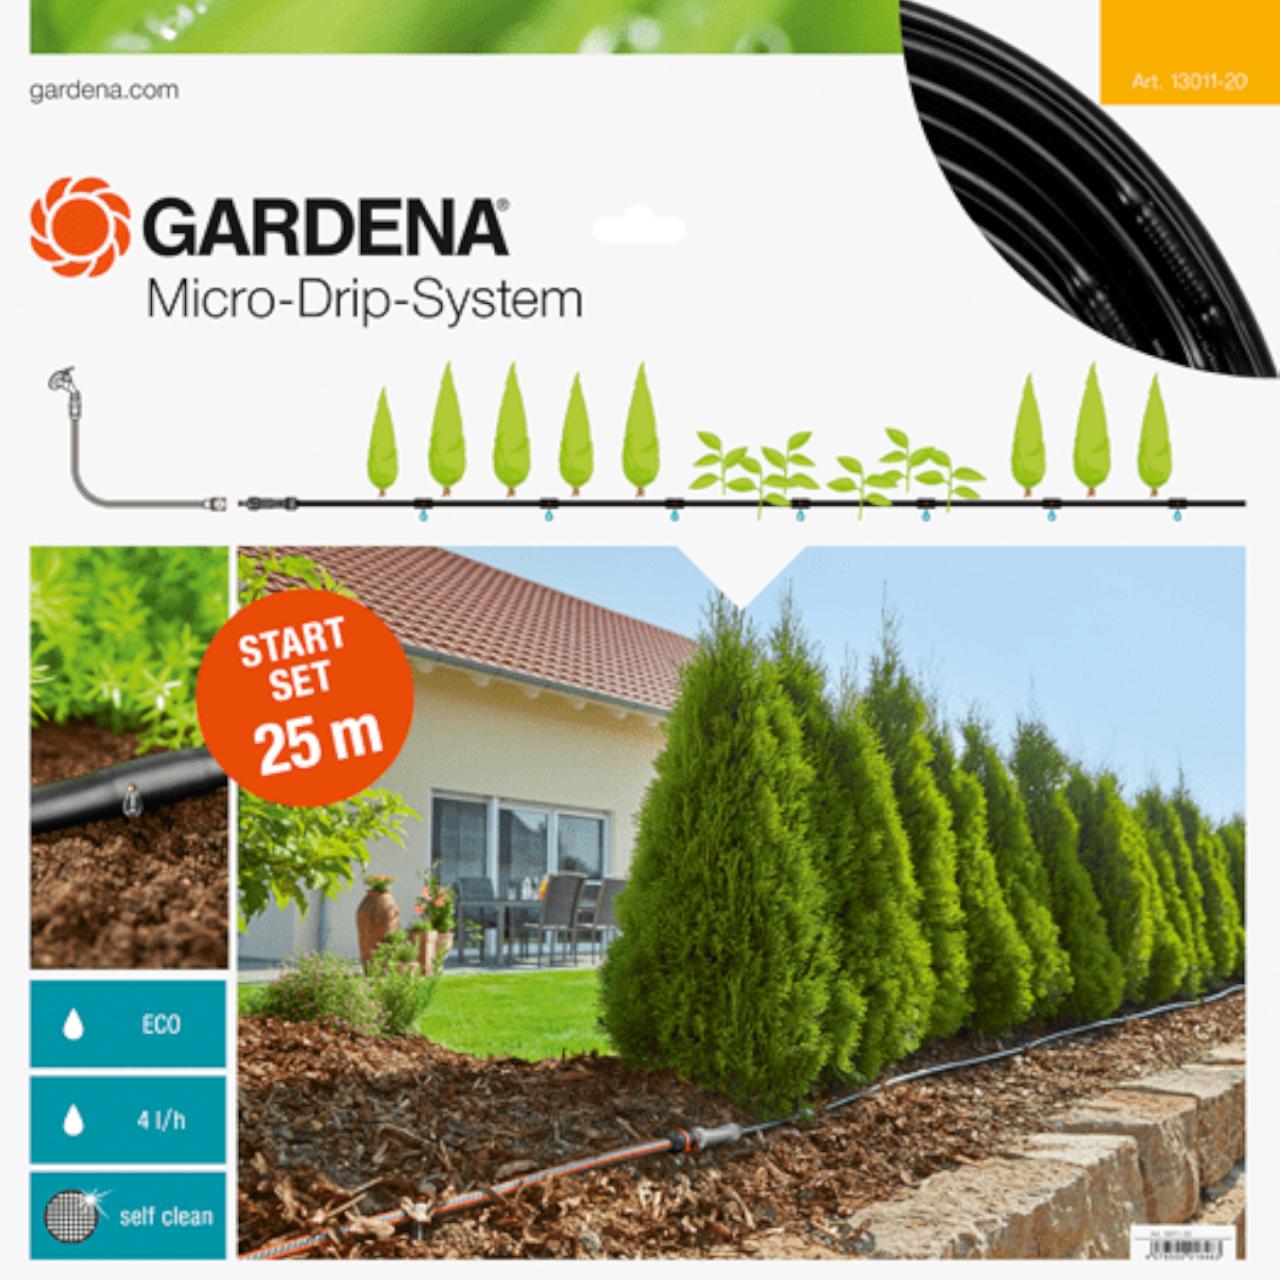 Gardena 13011-20 Micro-Drip-System Start Set Pflanzreihe M